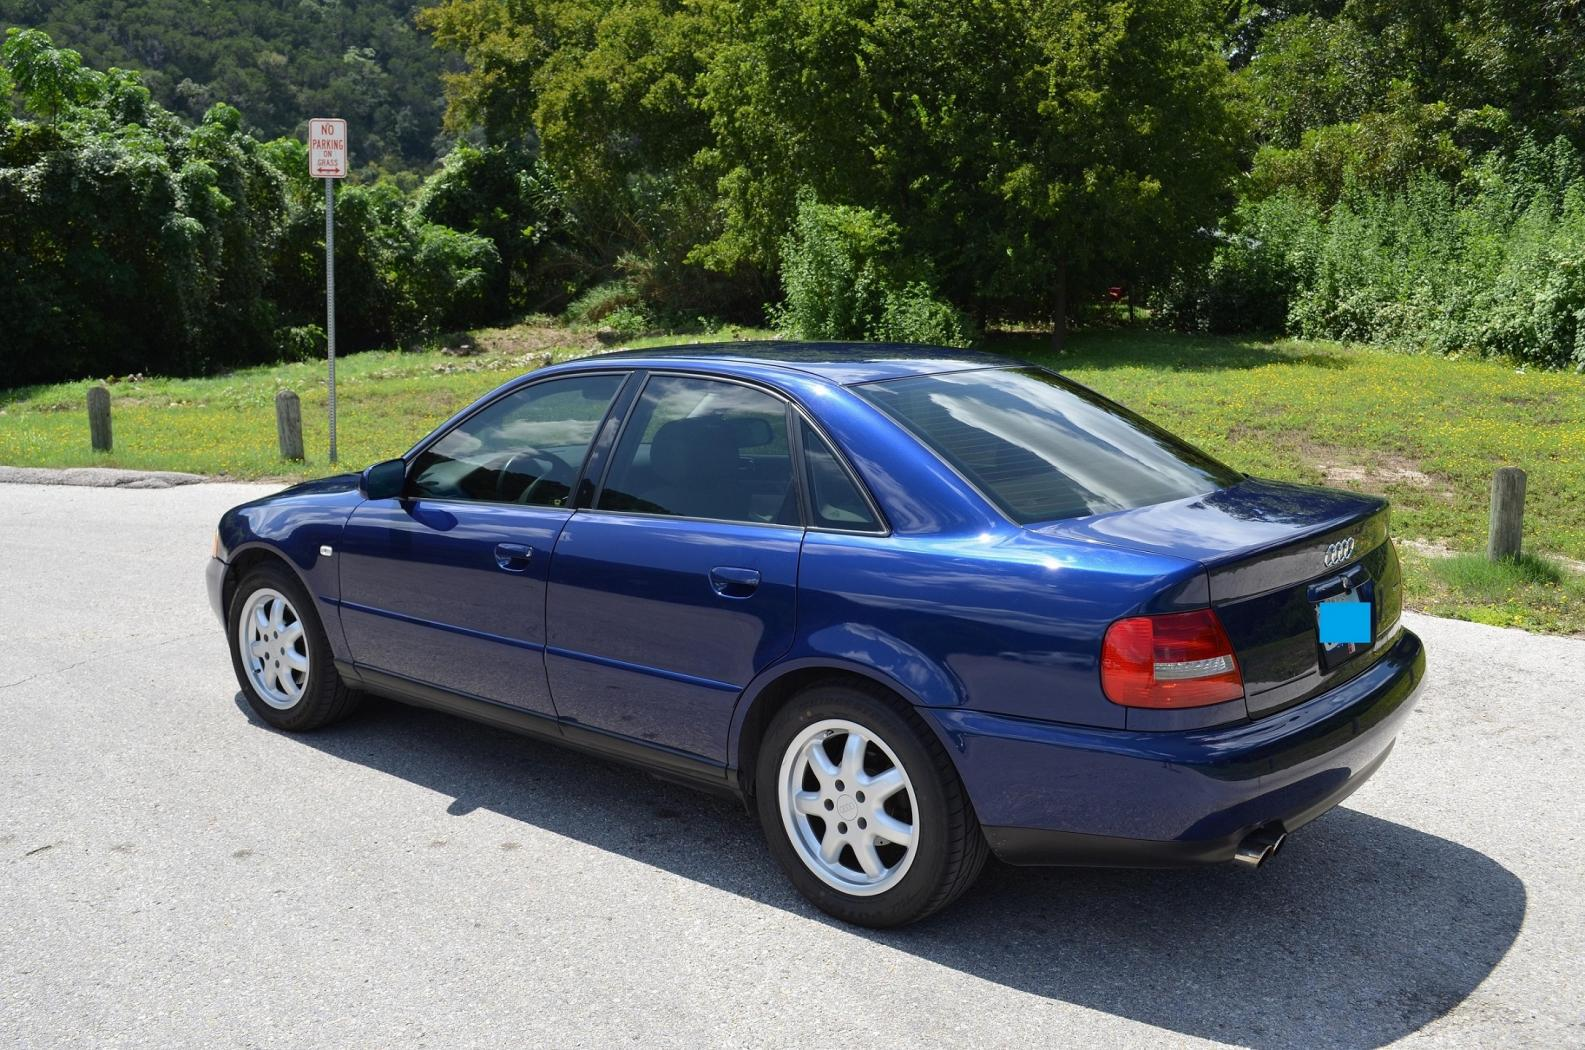 Tuto-remplacement-thermostat-sur-Audi-A4-B5-1.jpeg